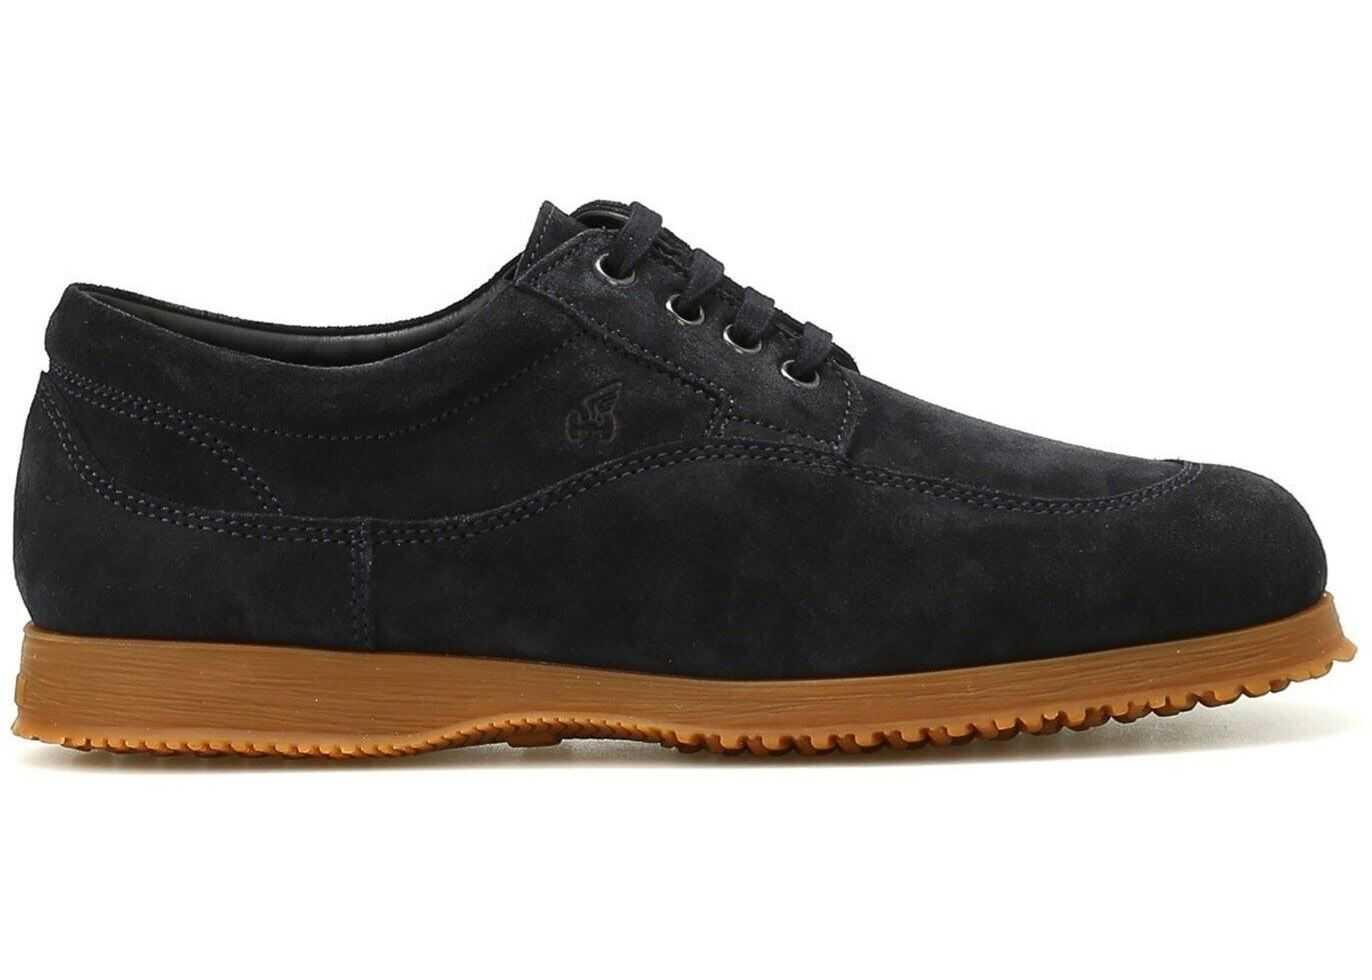 Hogan Traditional Suede Shoes In Blue HXM00E00110HG0U805 Blue imagine b-mall.ro